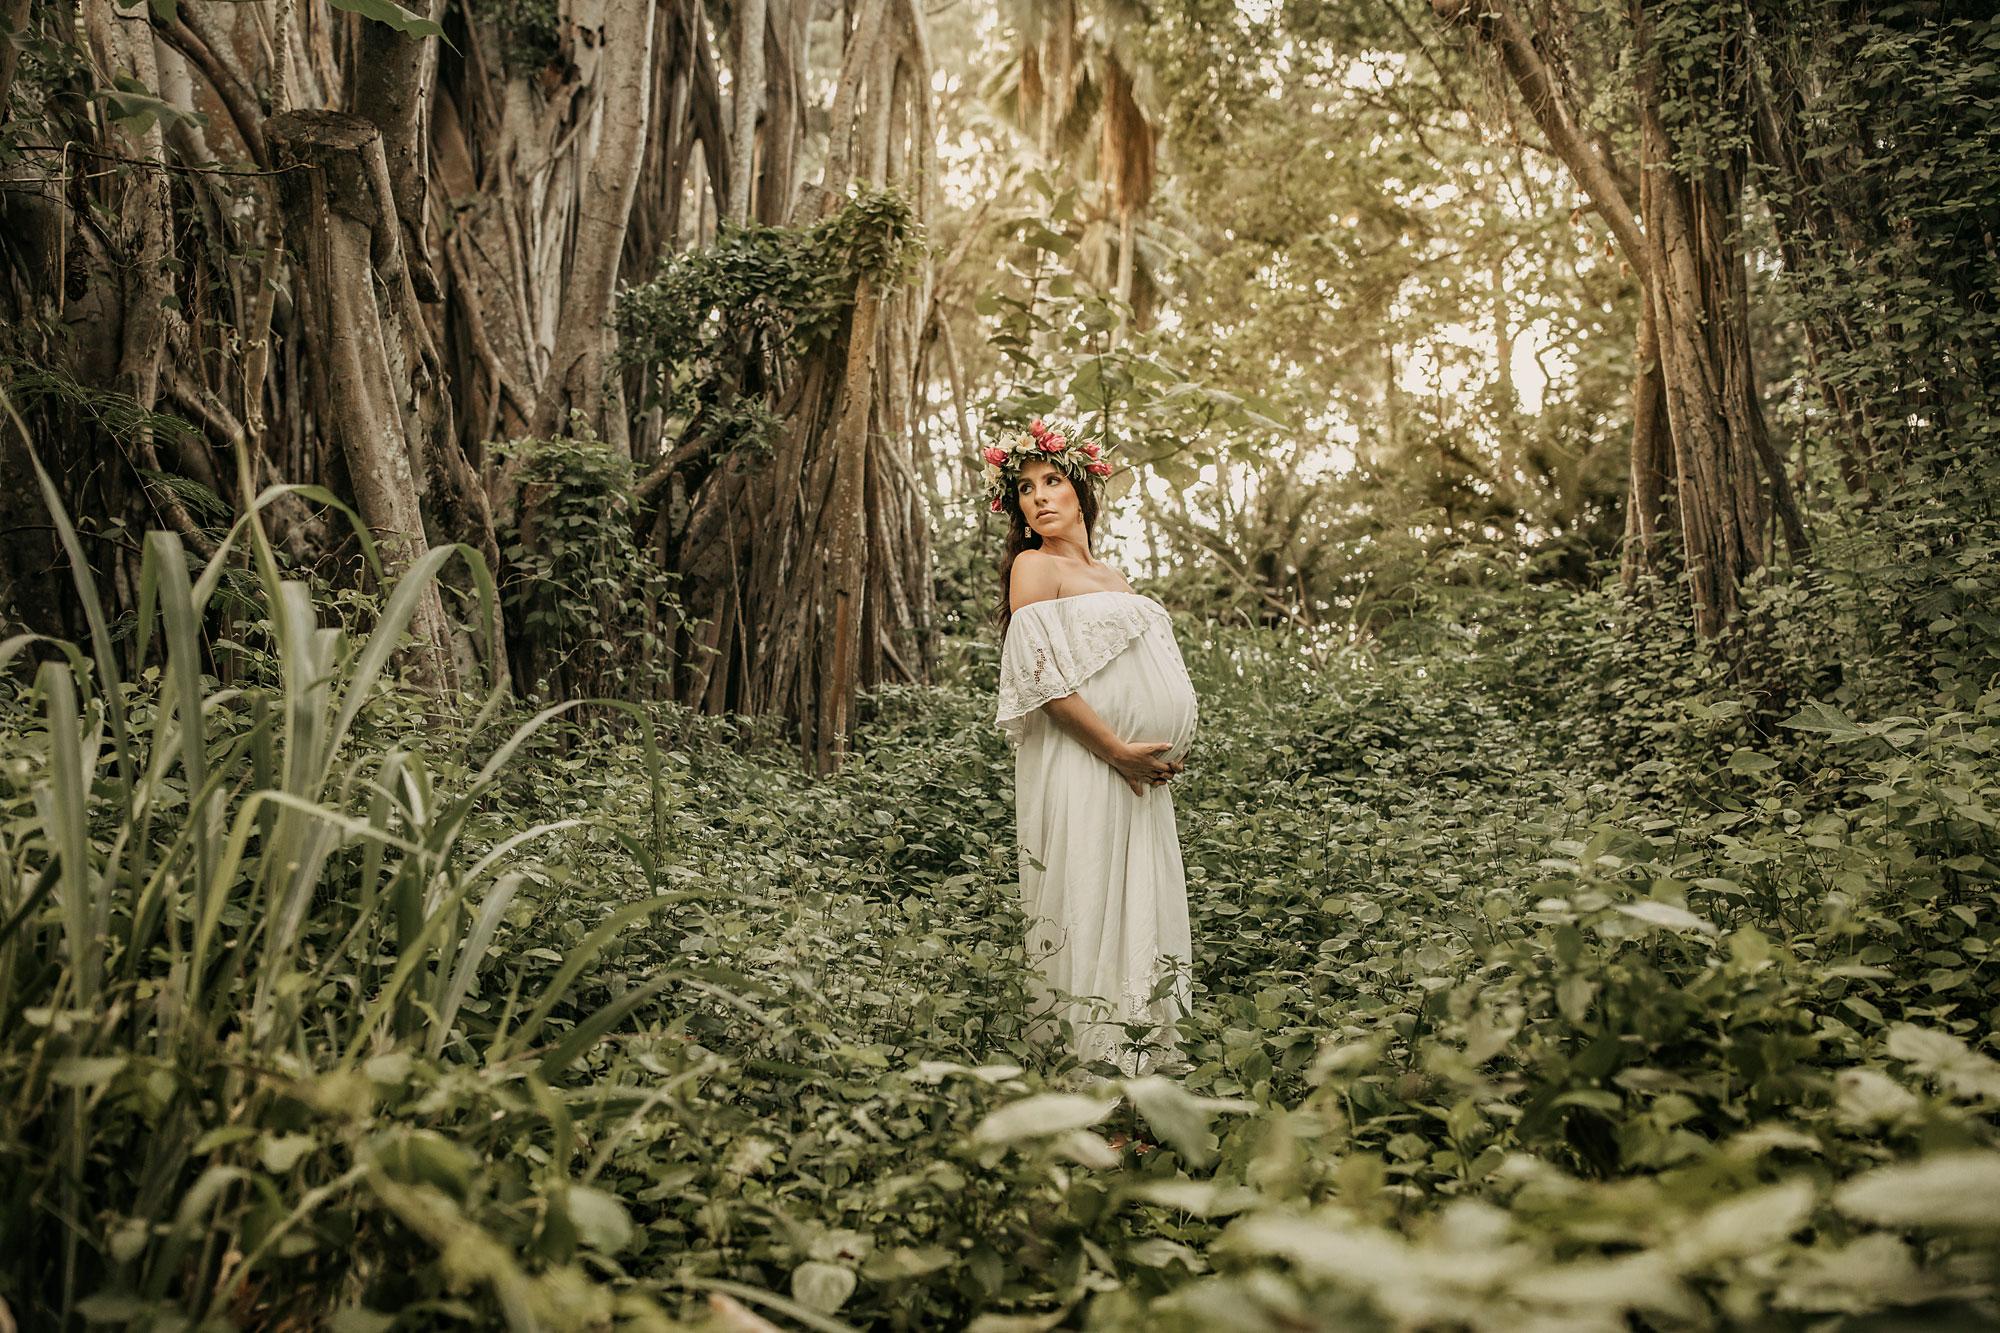 Hawaii-Oahu-Maternity-Photography-The-Sophia-Co-011.jpg